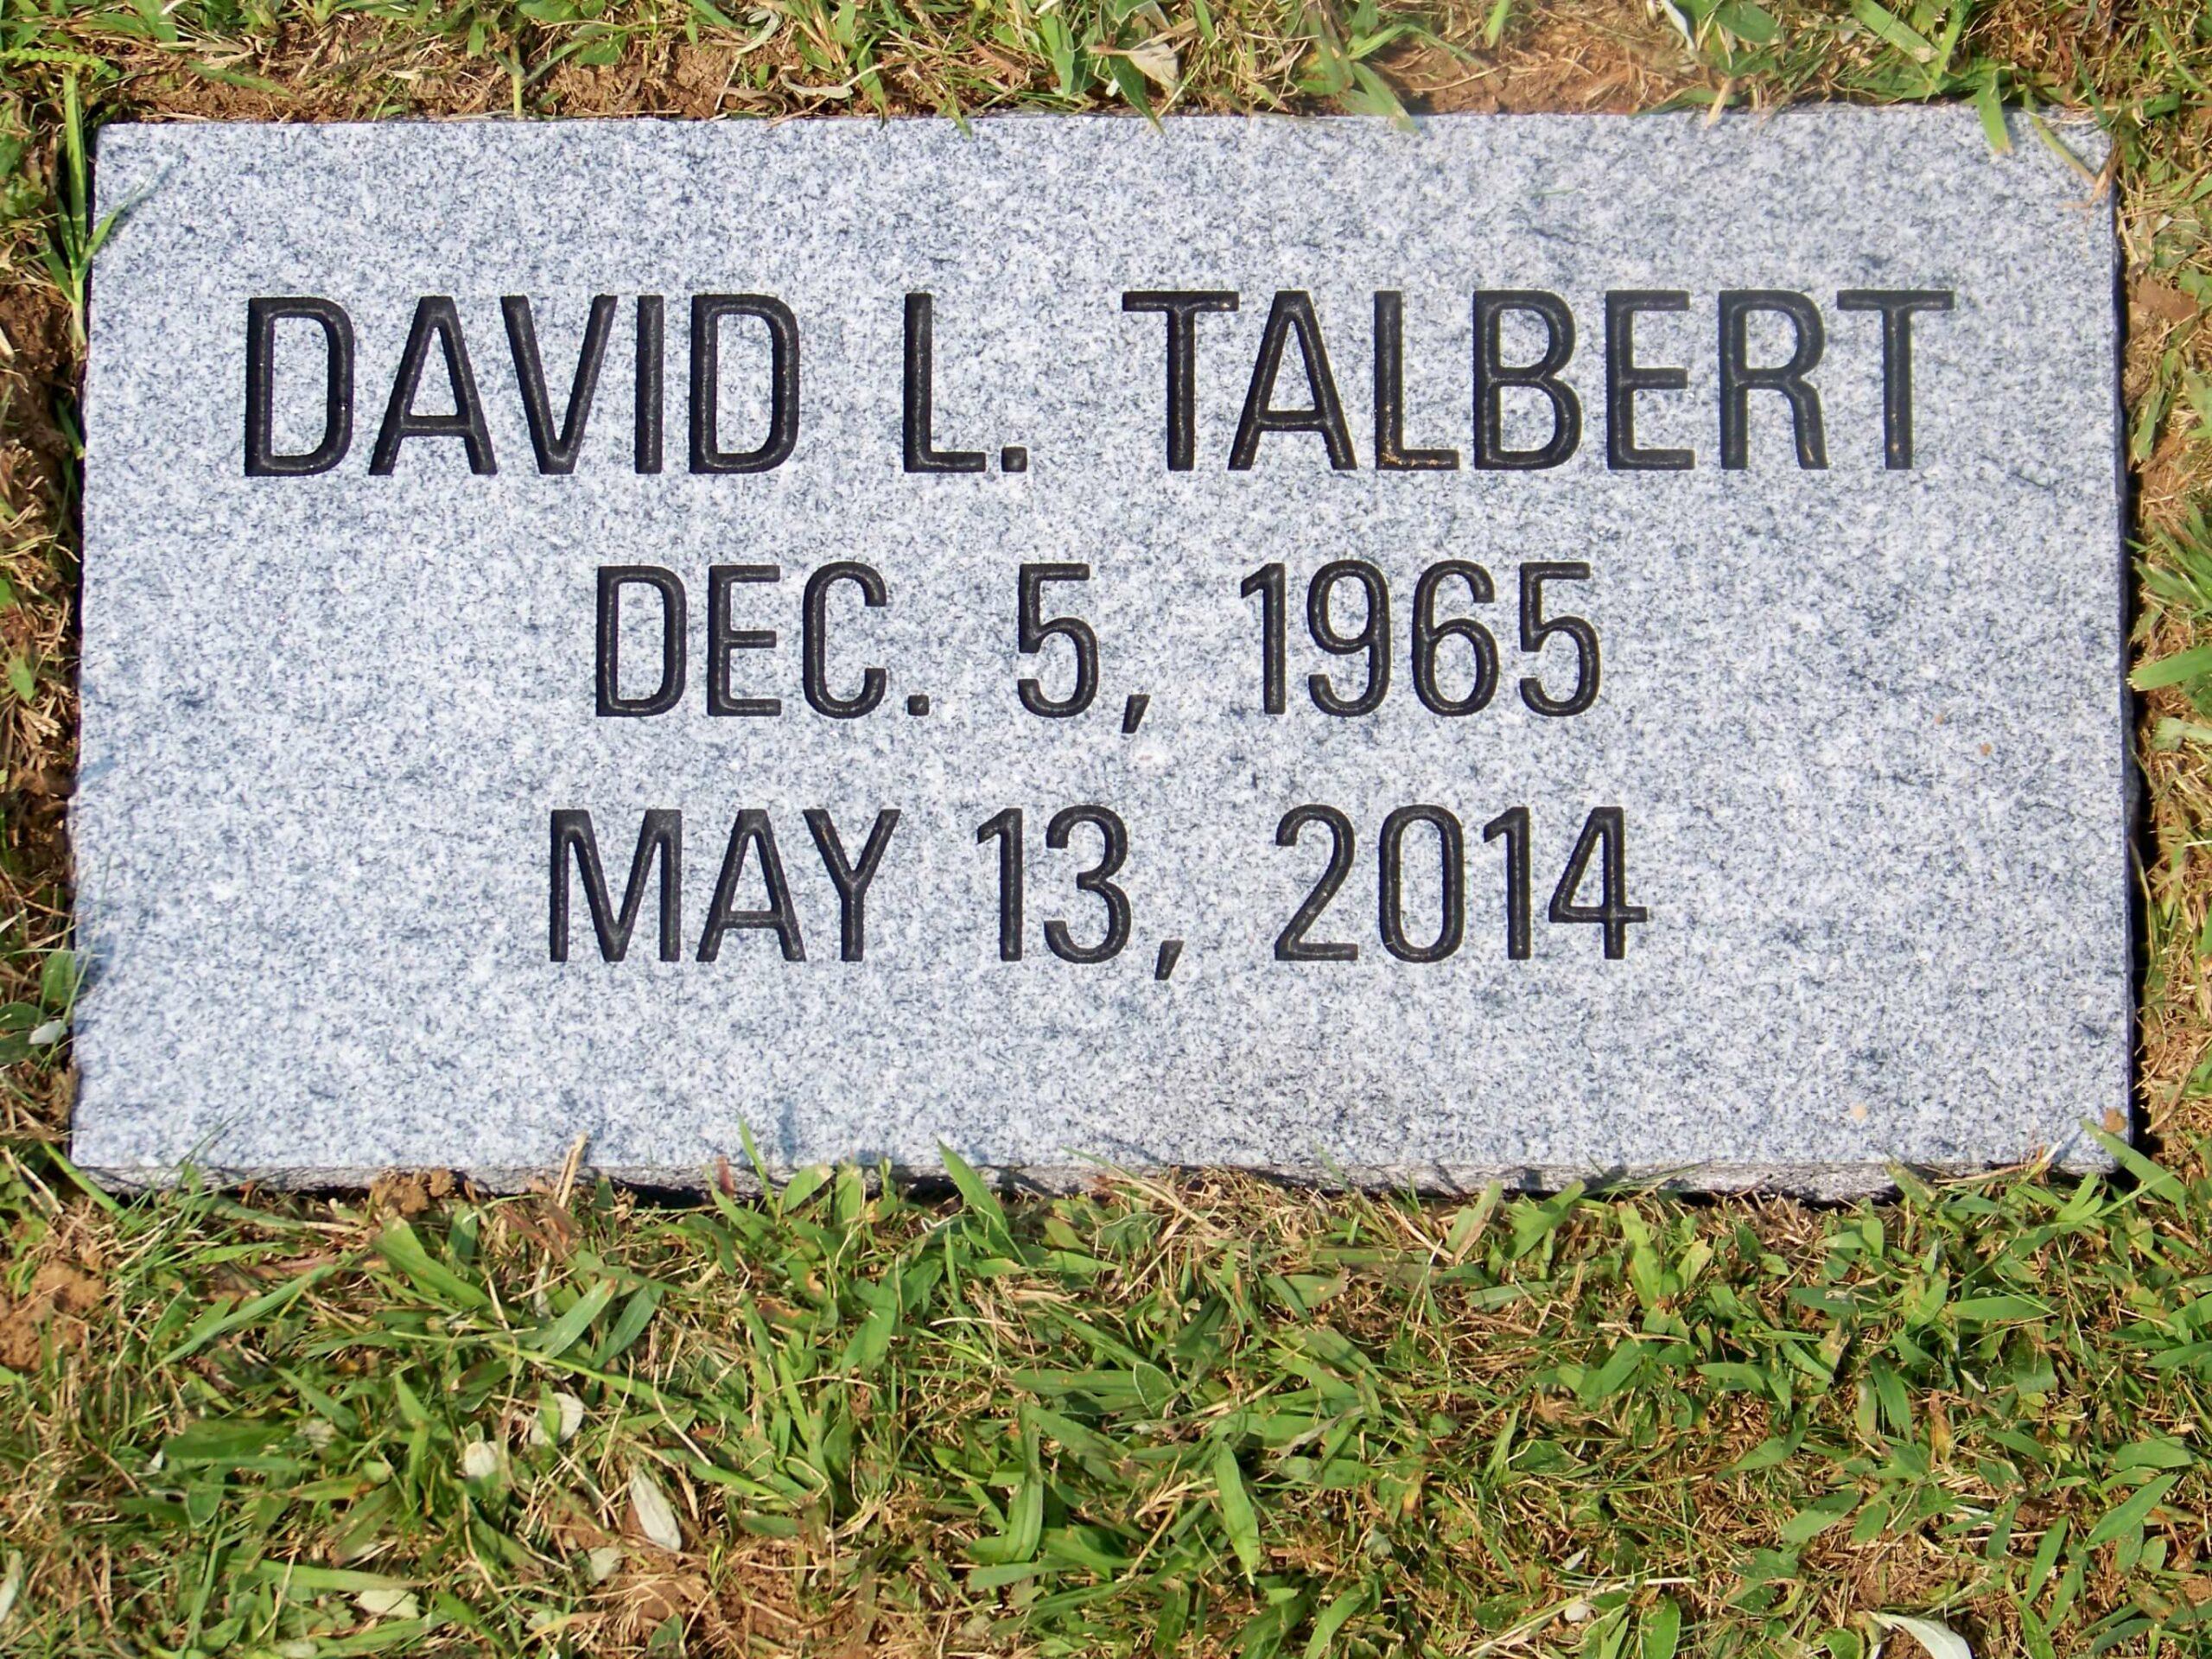 Talbert, David - Greenwood Byesville